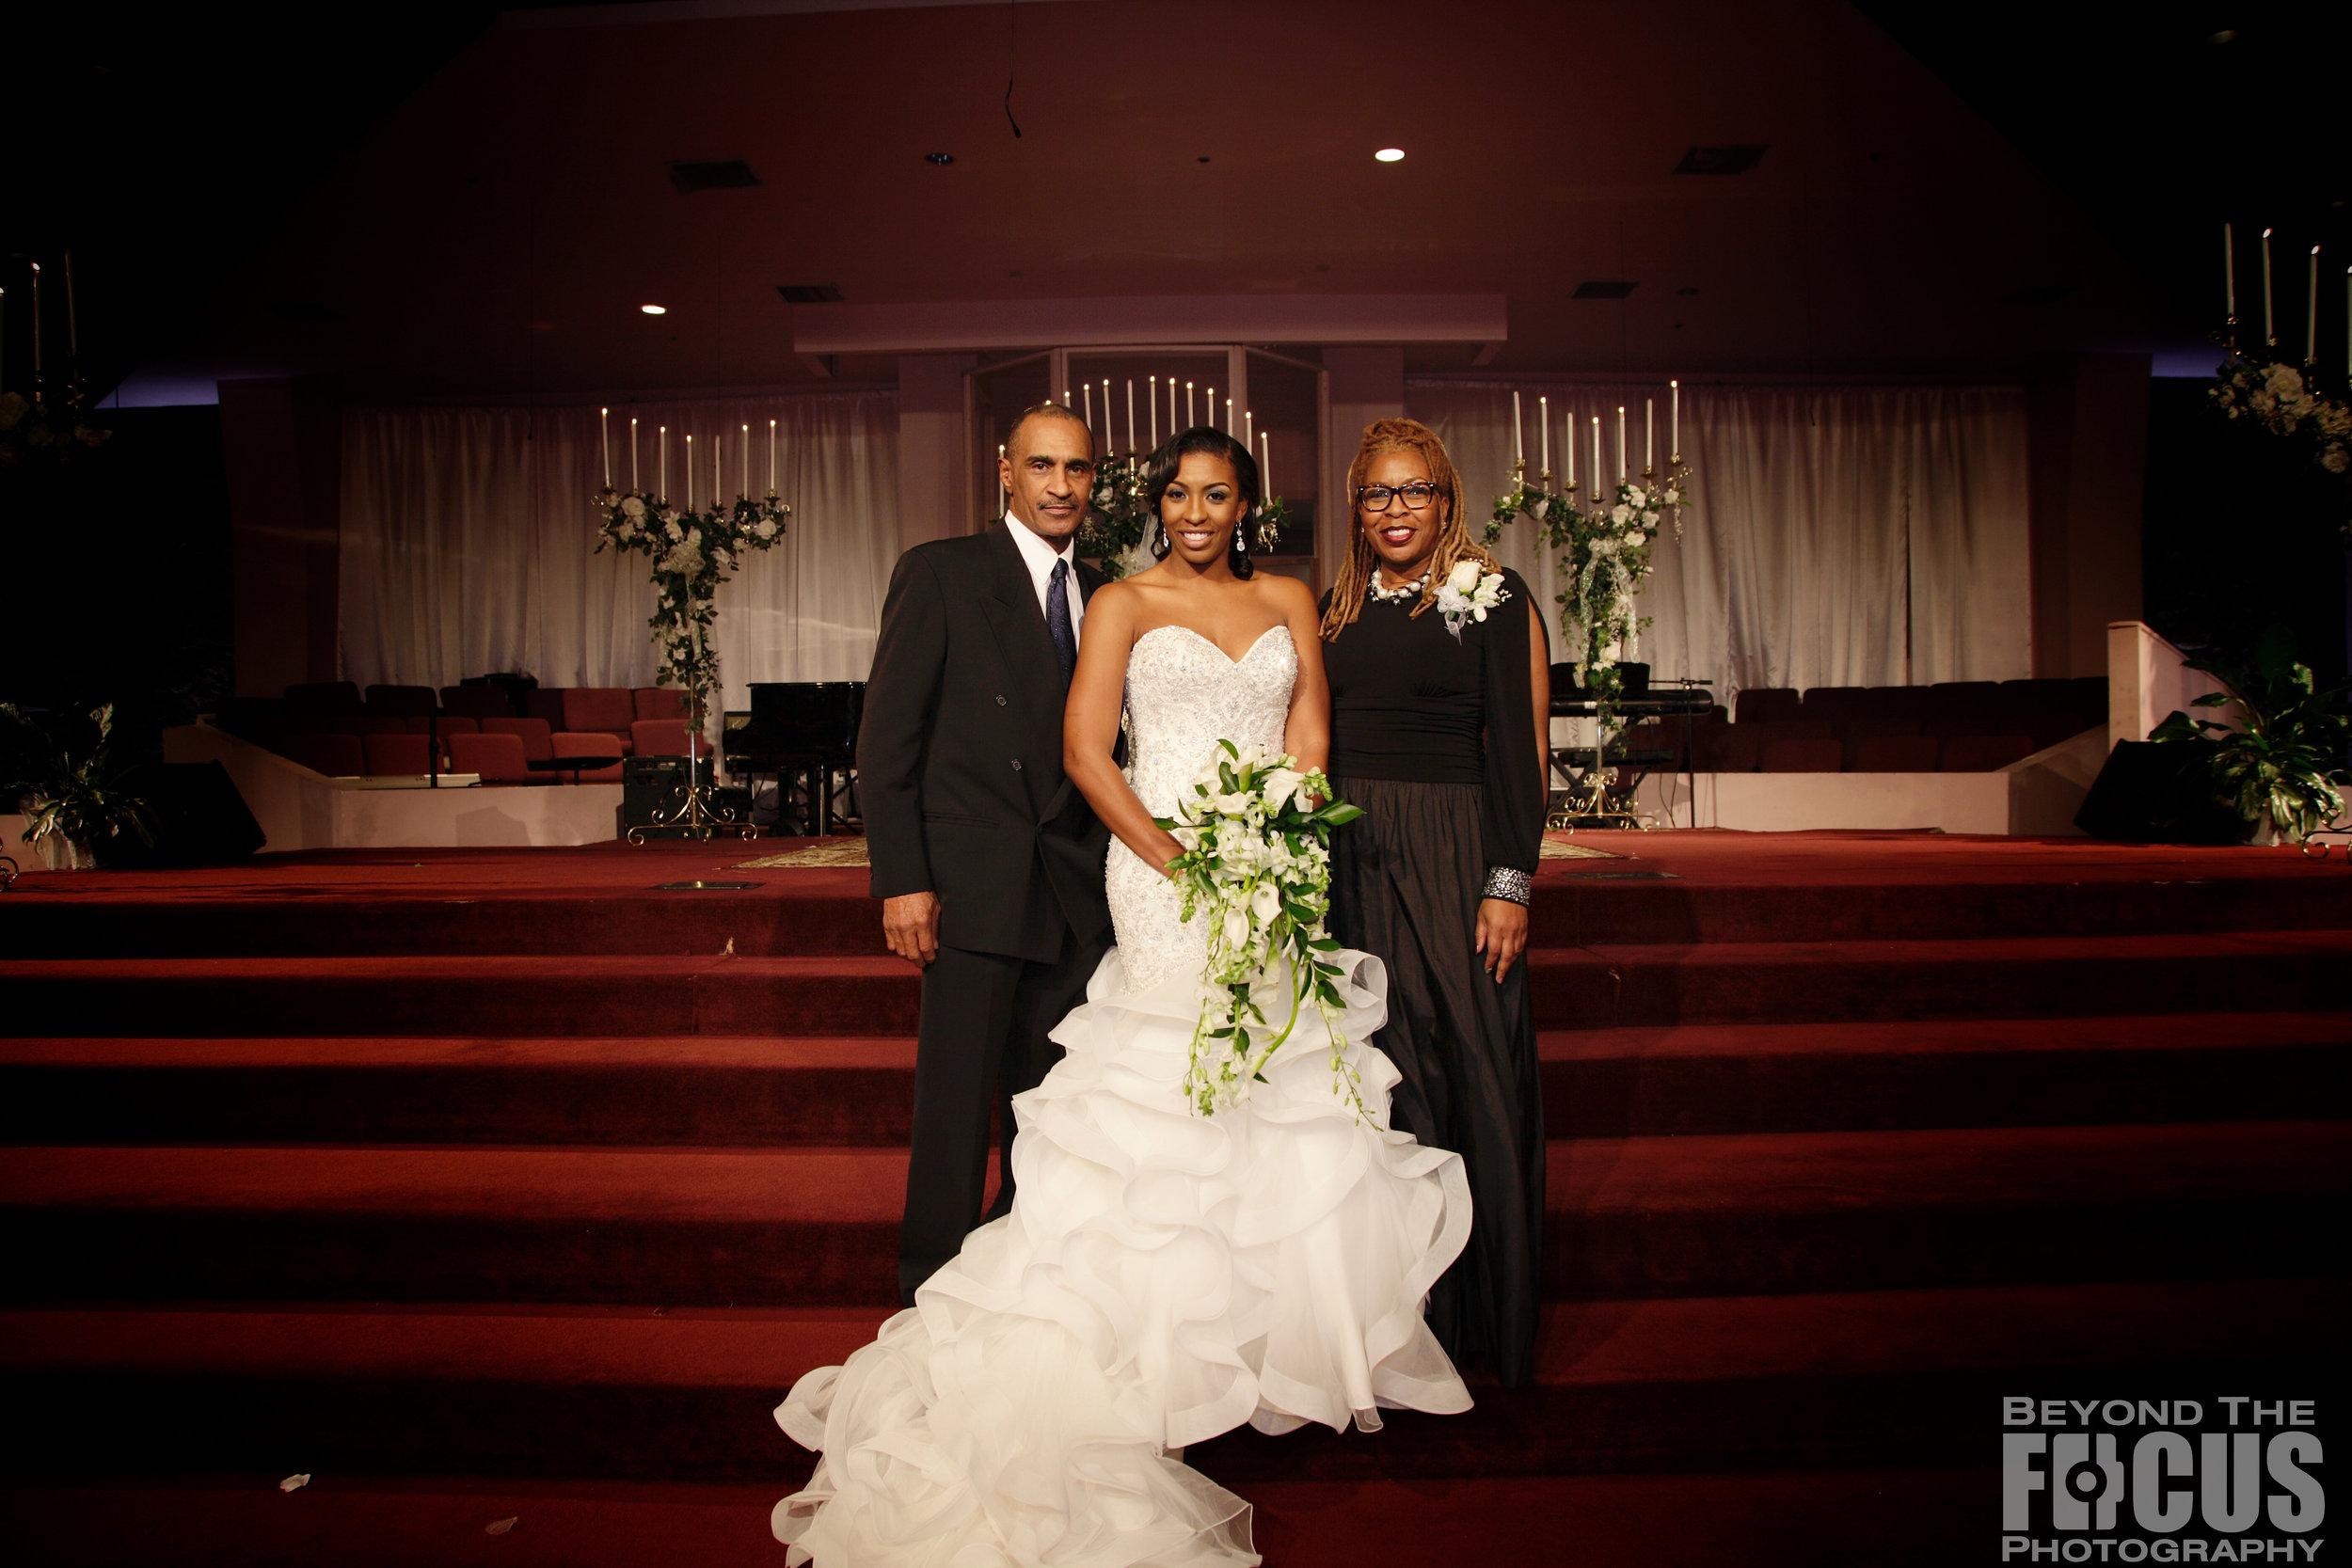 Matthews_Wedding_Ceremony_141.jpg